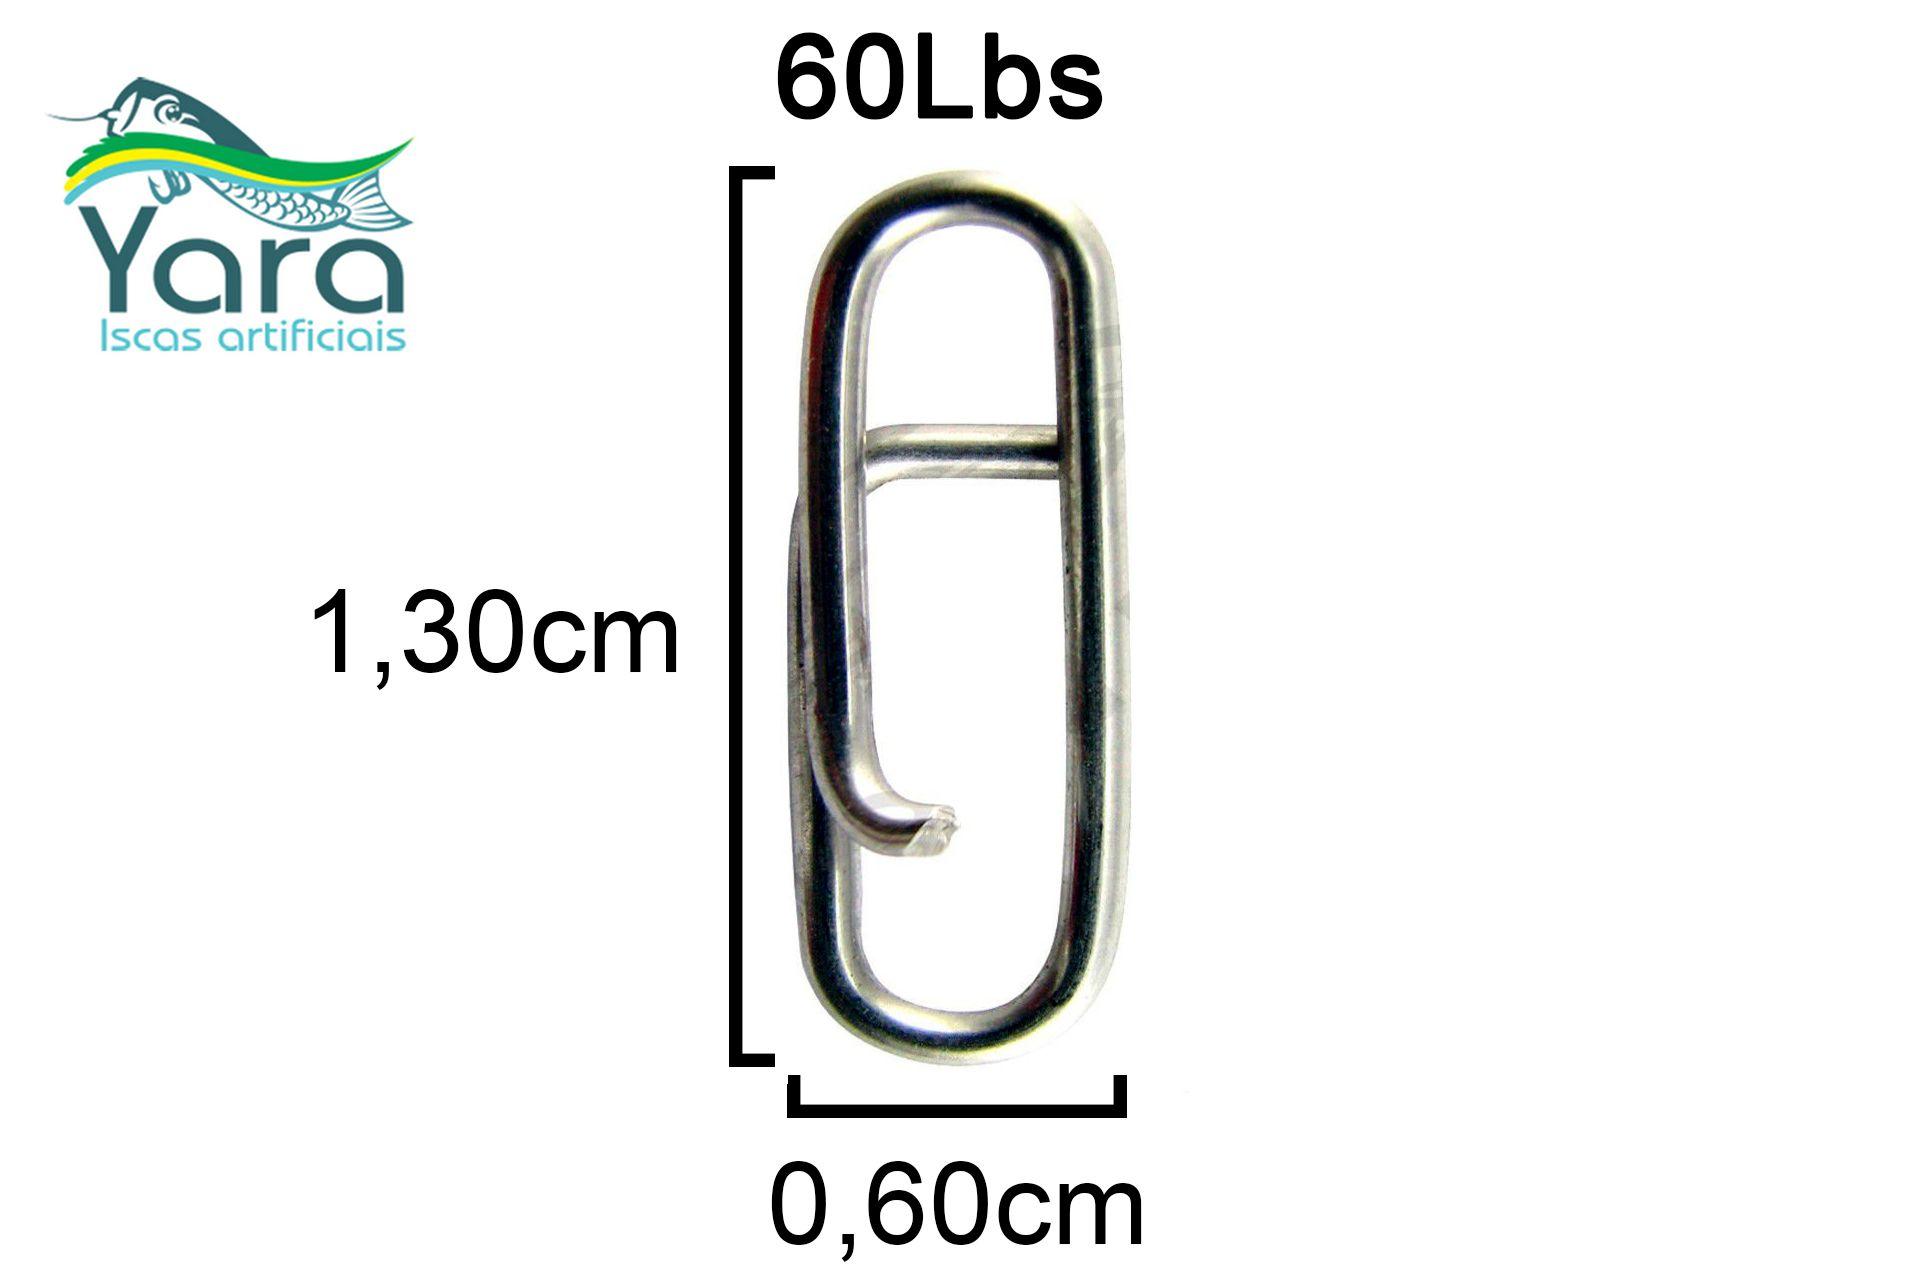 Snap Engate Rápido Yara - 60Lbs - 10 Unidades  - Life Pesca - Sua loja de Pesca, Camping e Lazer